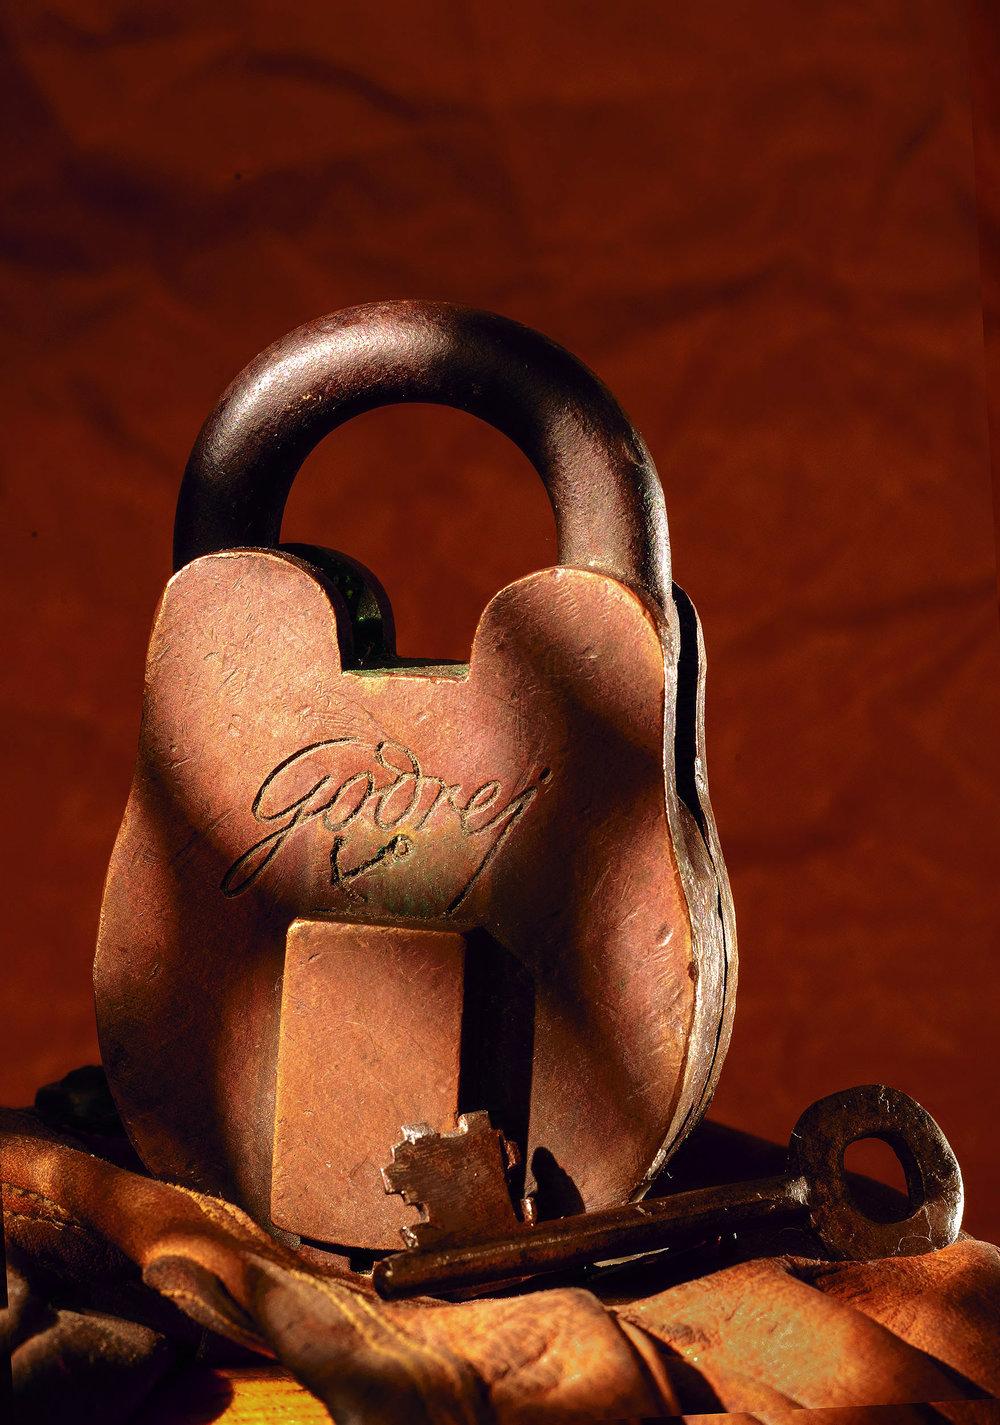 pad-lock-#1 copy.jpg